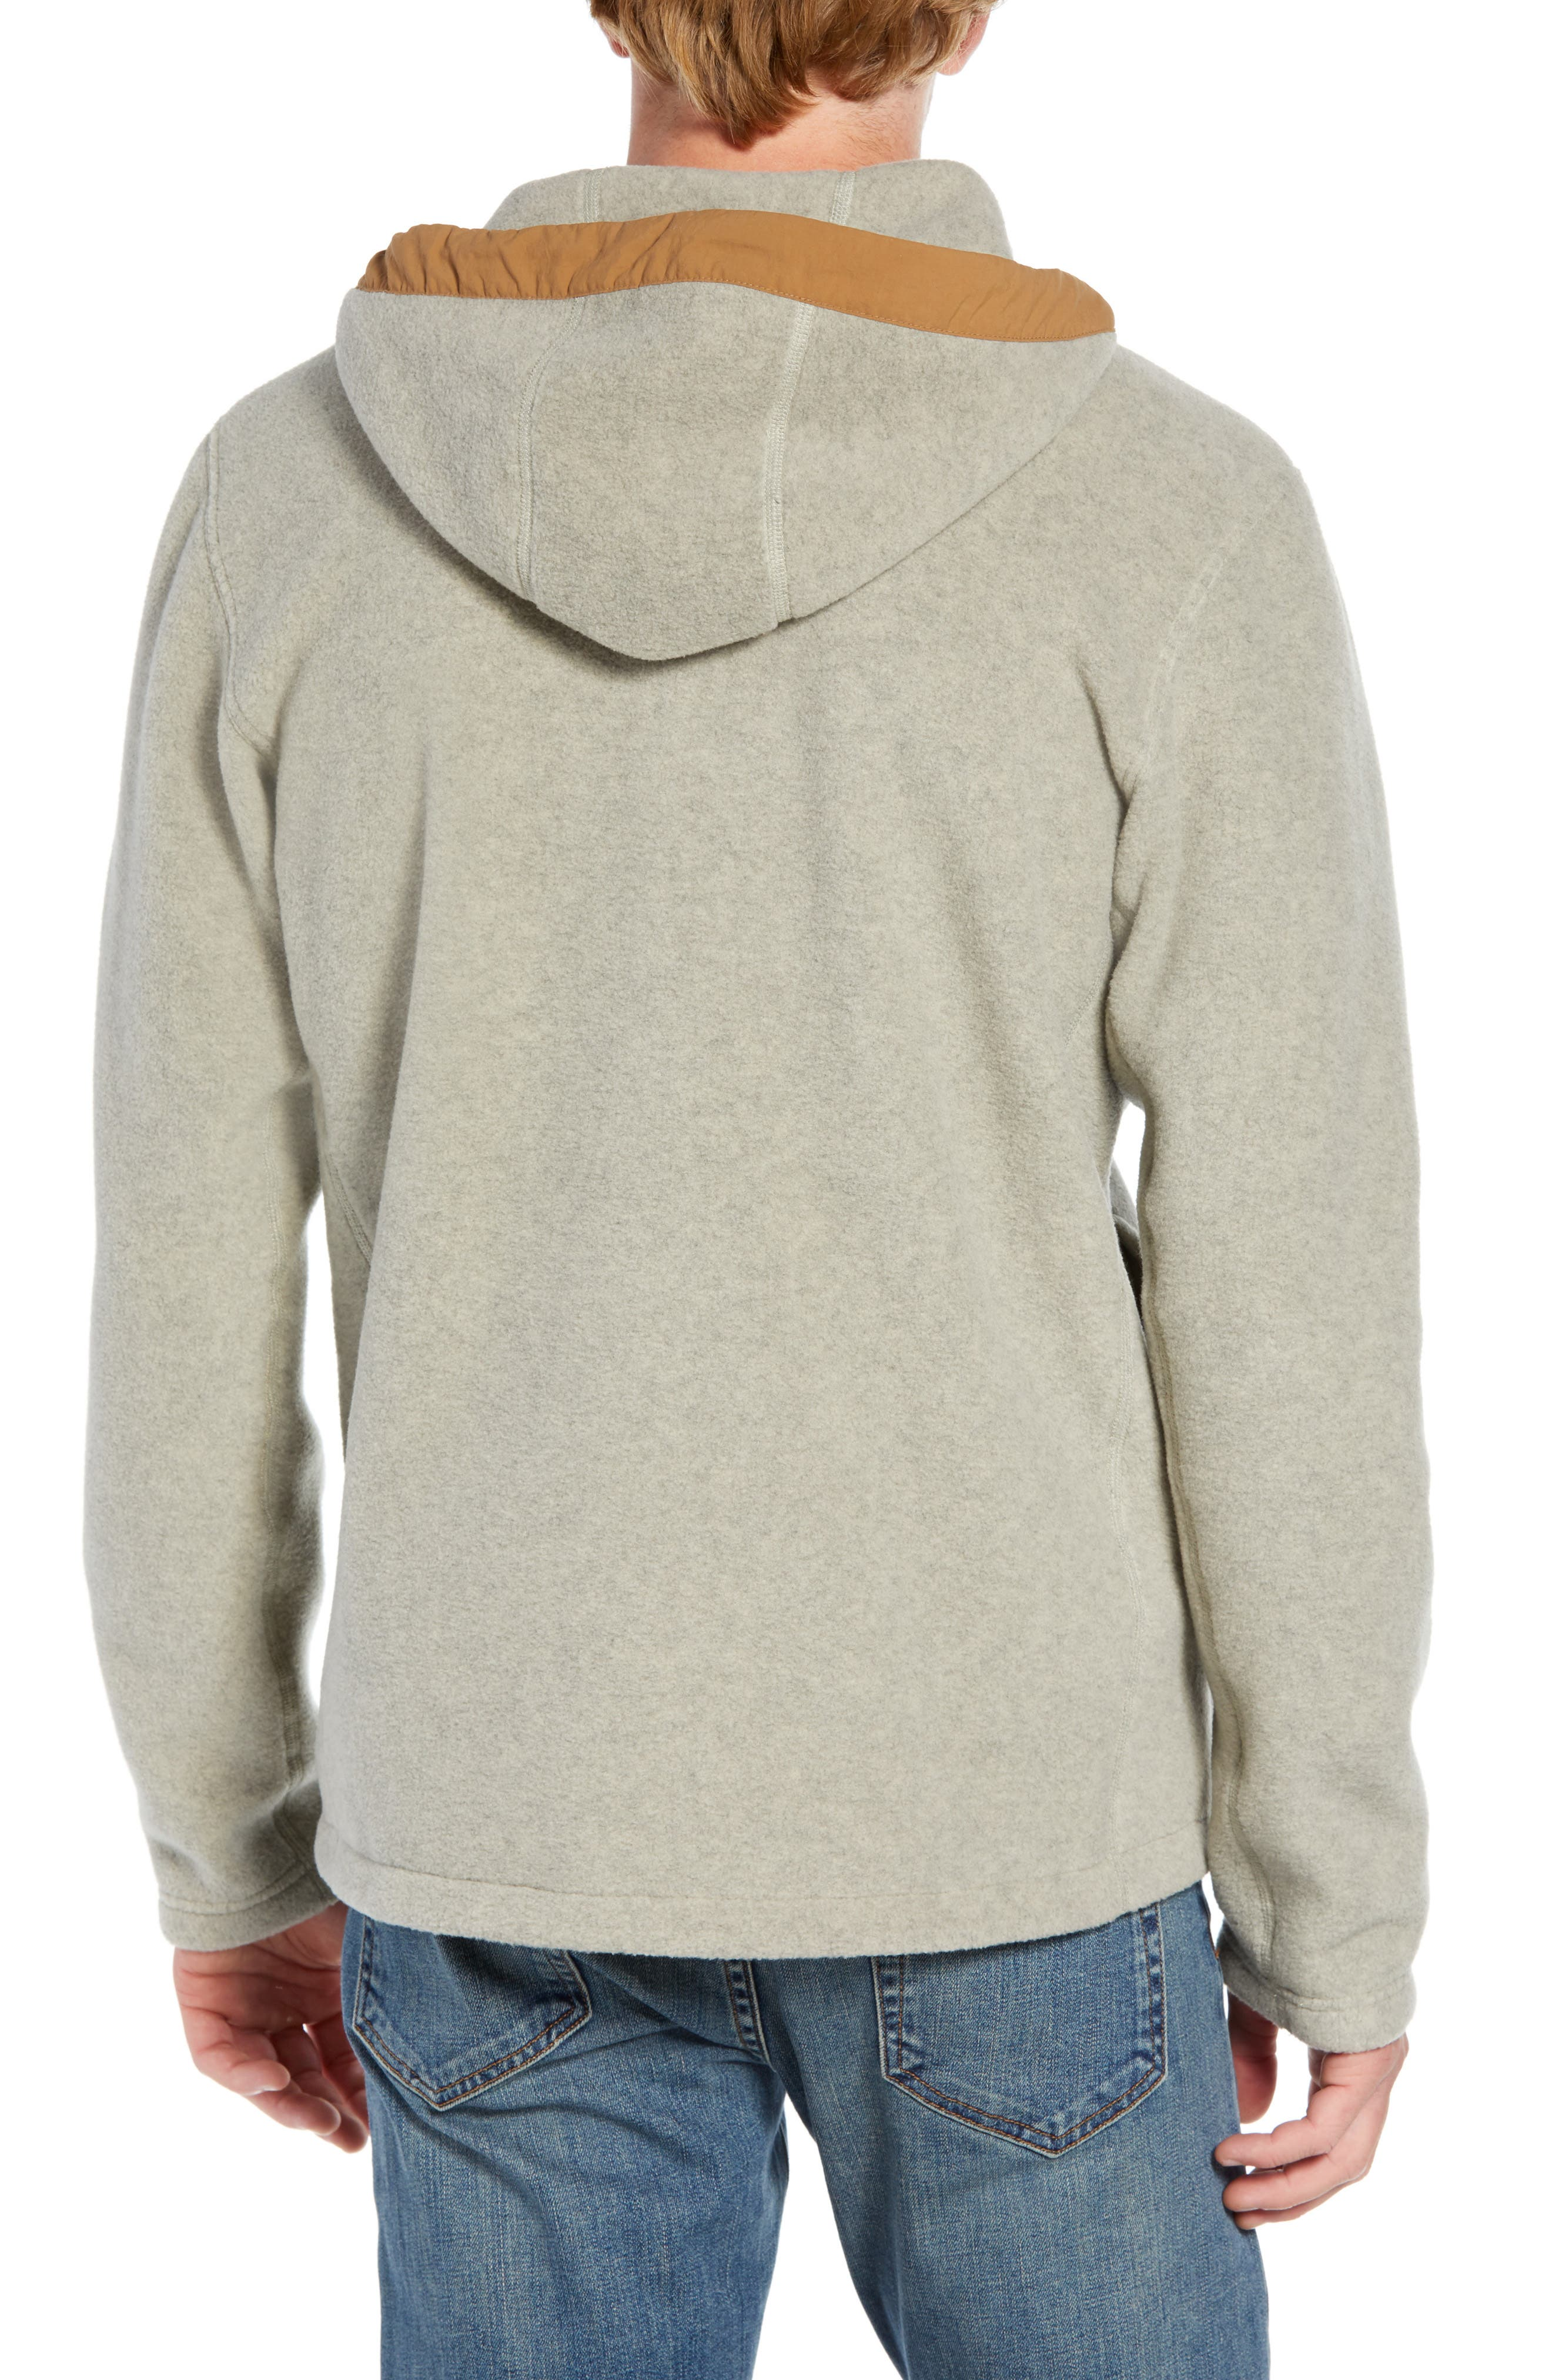 Pyrite Sweater Knit Fleece Hoodie,                             Alternate thumbnail 2, color,                             GRANITE BLUFF TAN HEATHER